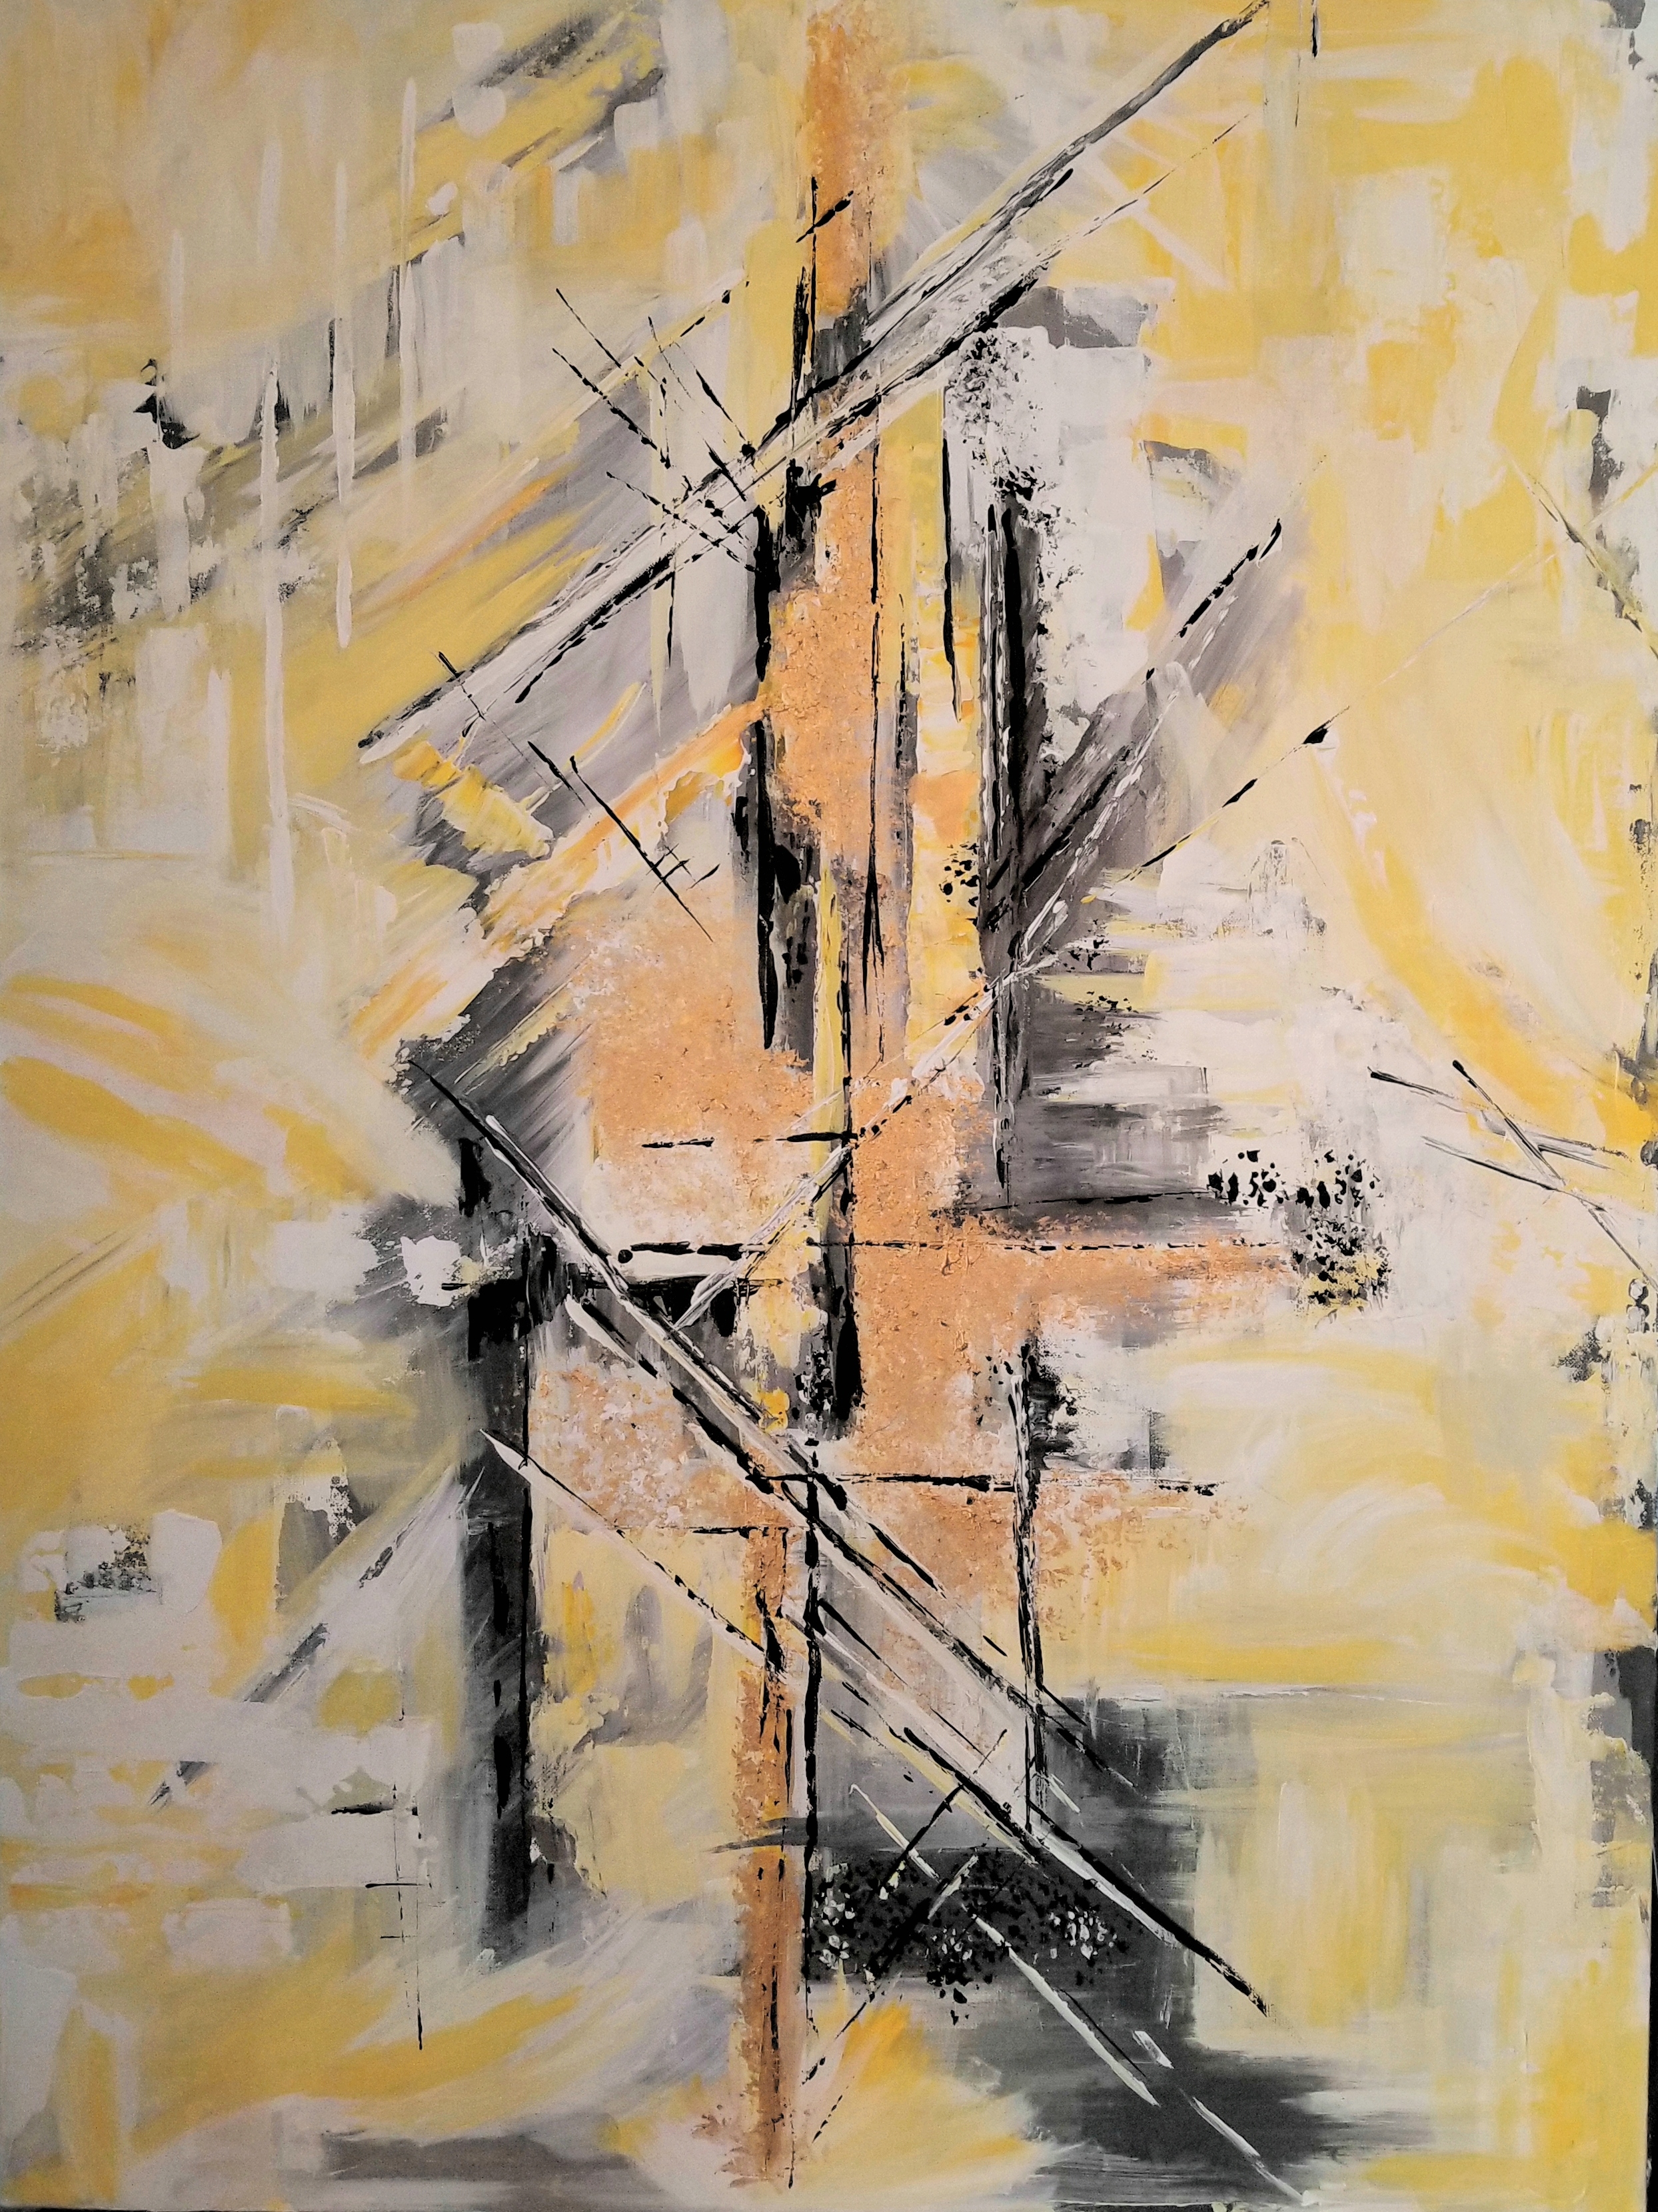 """Urban Life"" - 36"" x 48"" FramedContact: The Art Department14435 N. Scottsdale Rd. #300Scottsdale, AZ 85254480.596.9800"